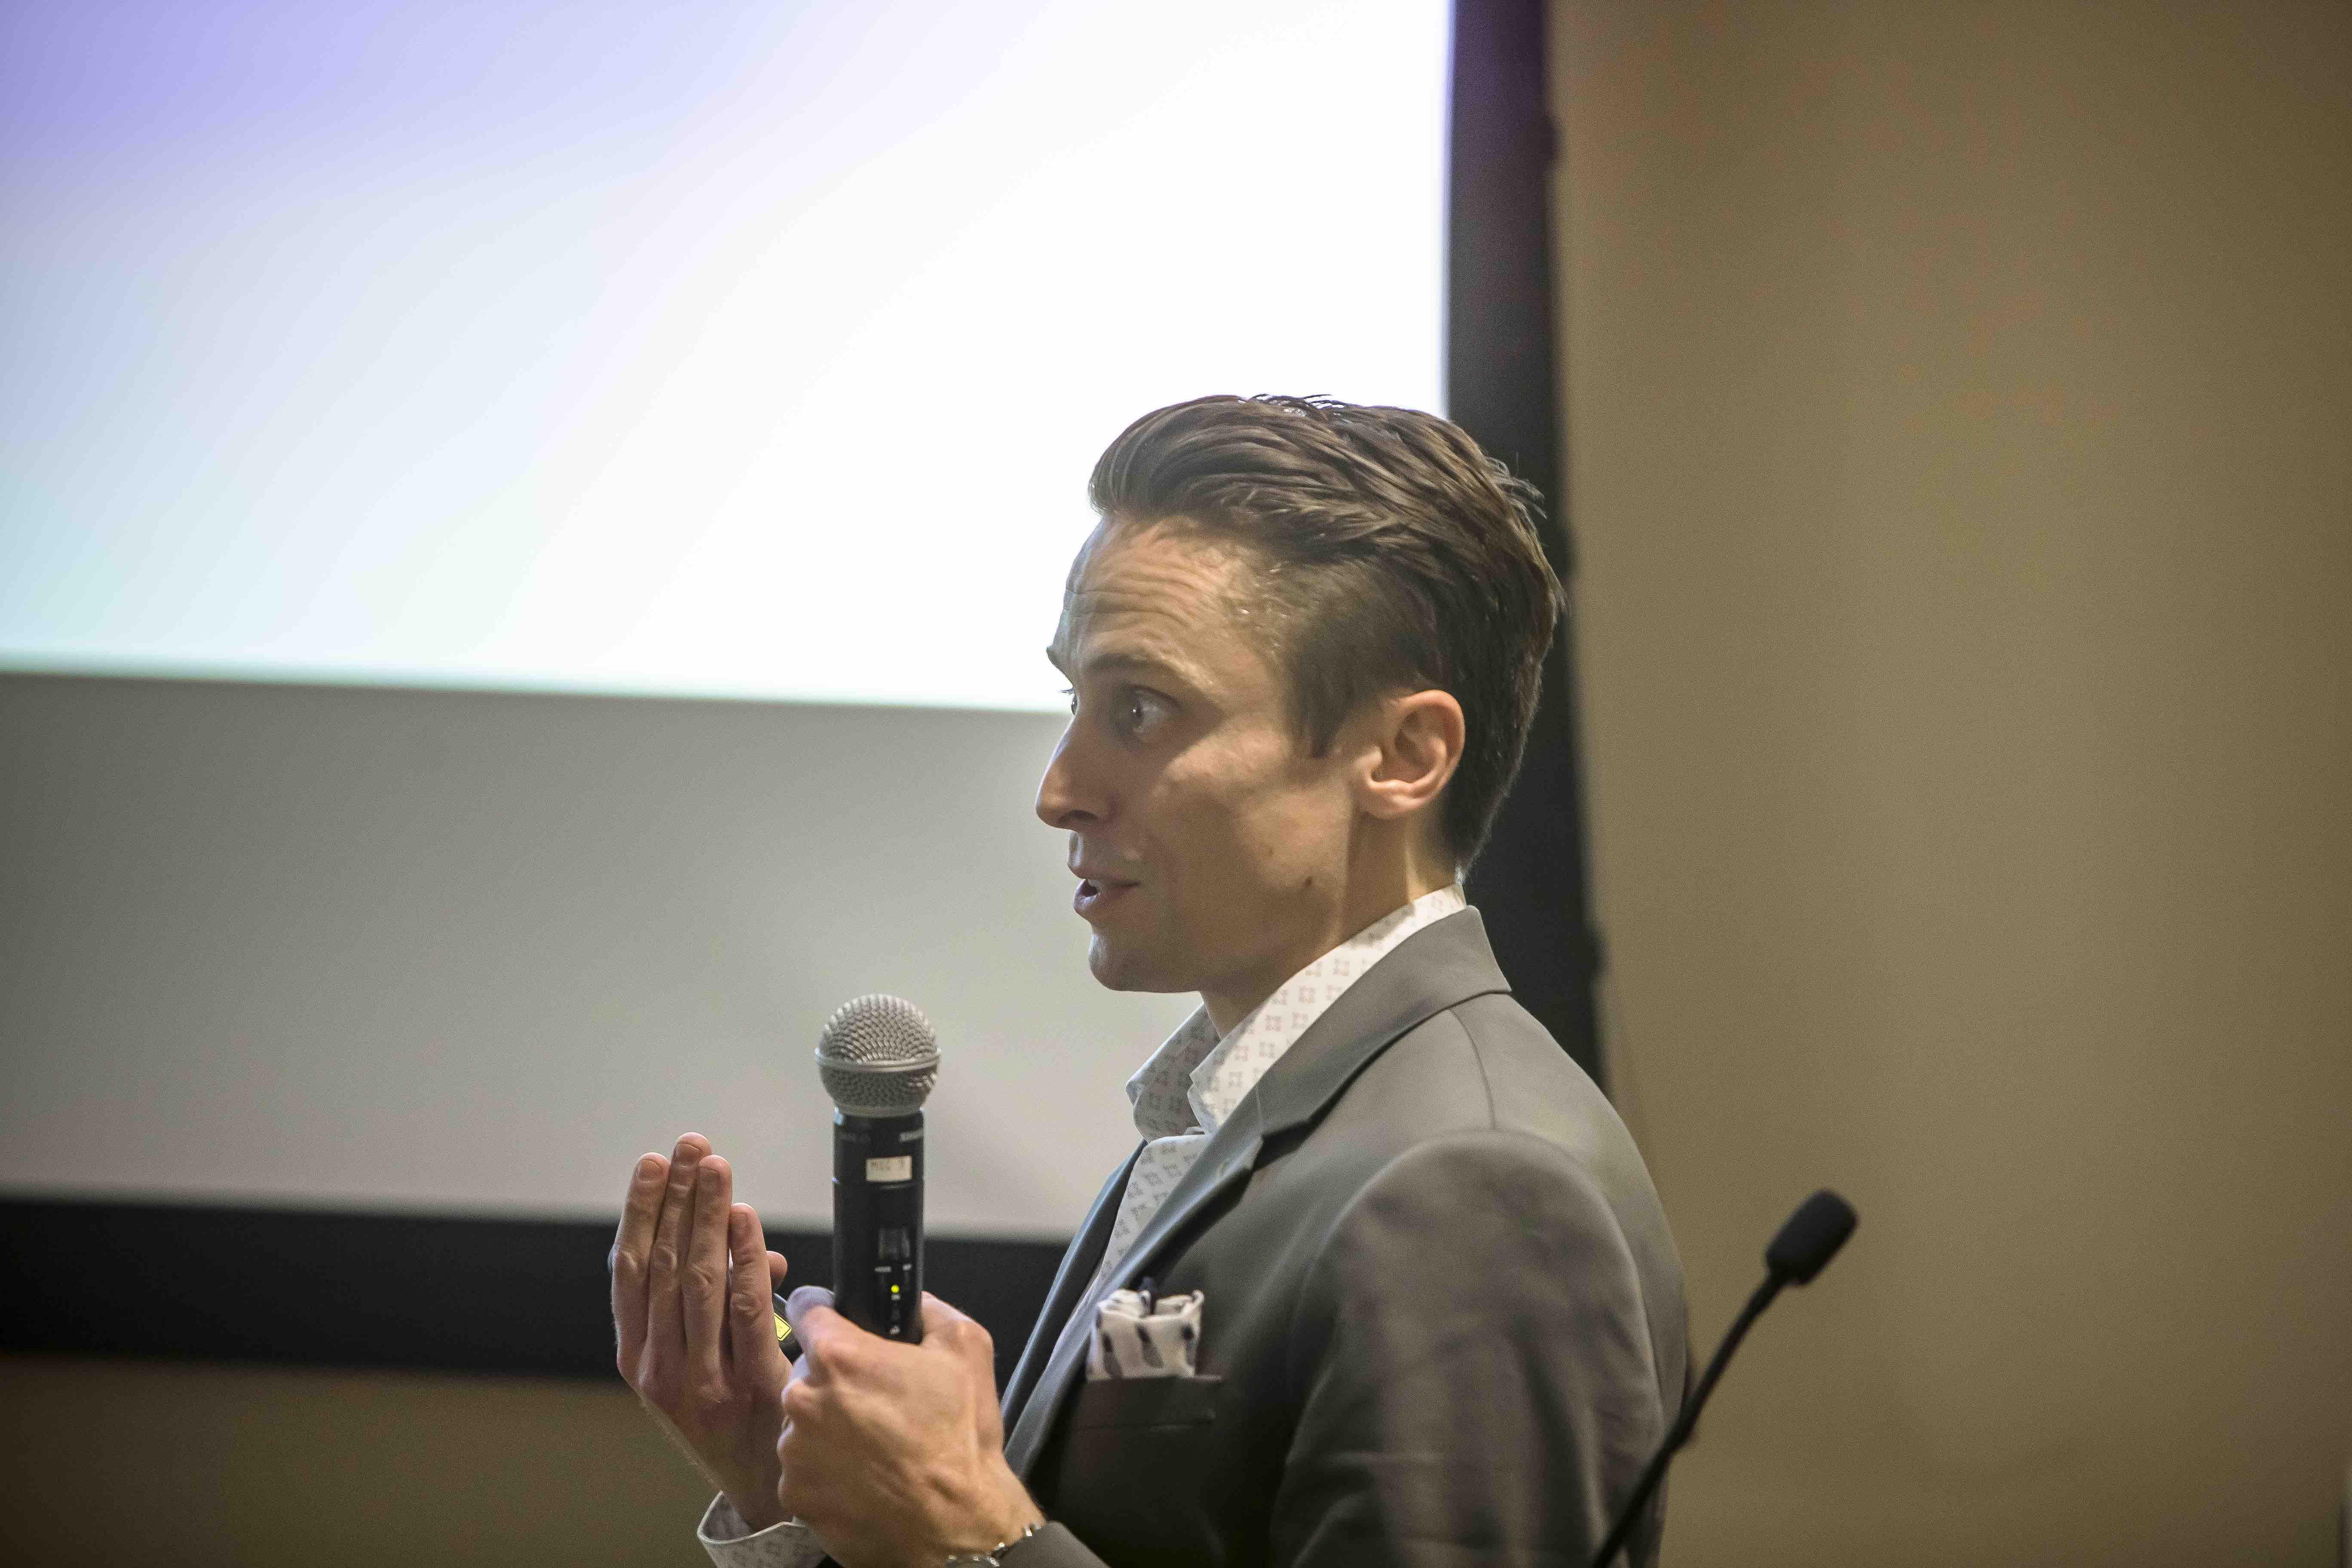 Todd Haggerty, CU Denver assistant vice chancellor for budget